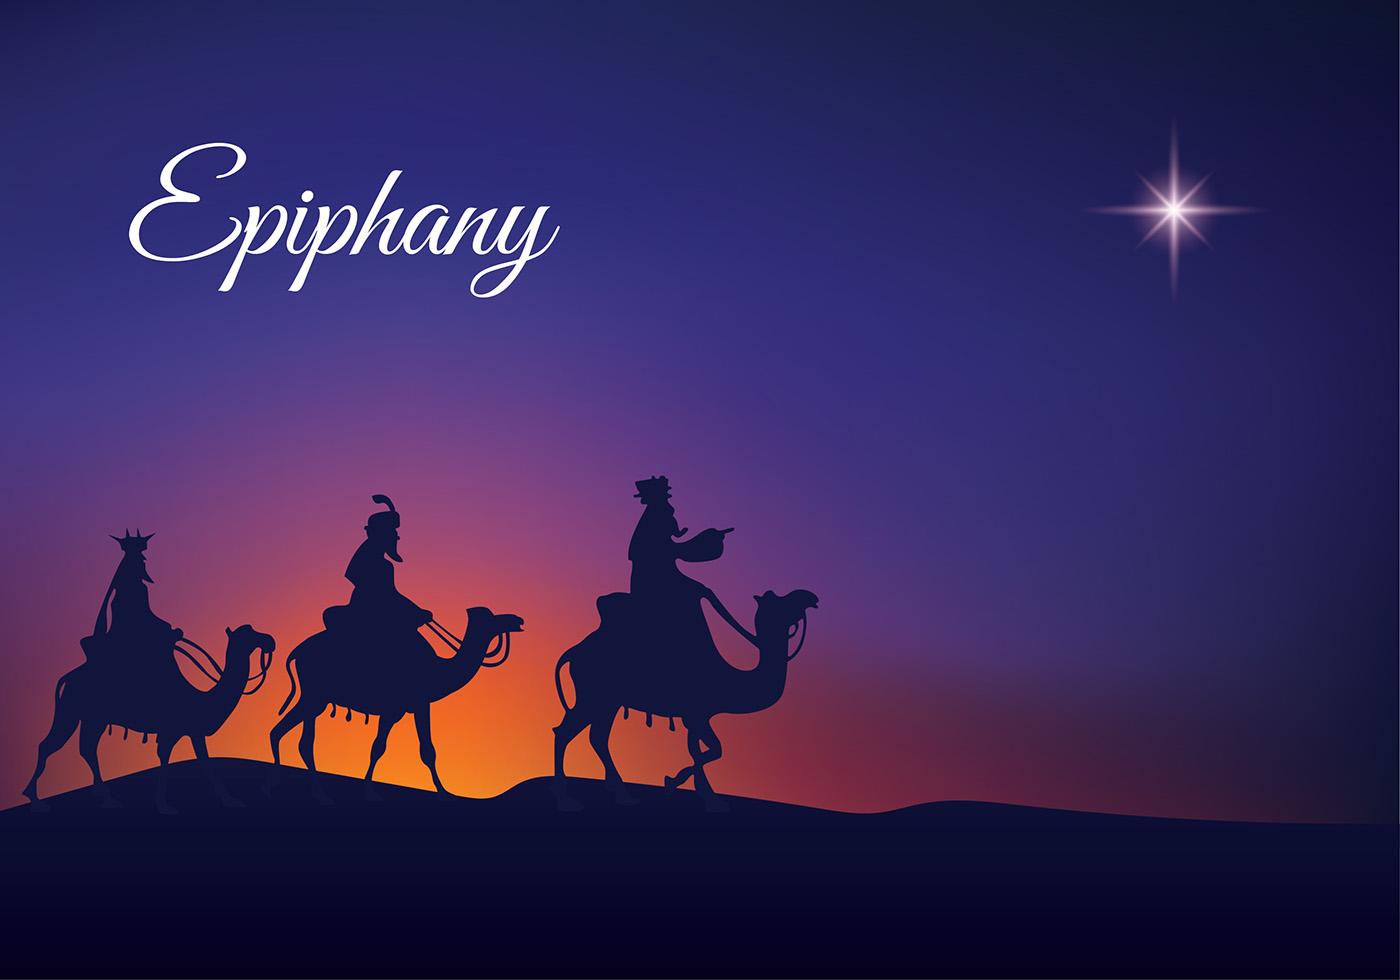 epiphany-night-silhouette-free-vector.jpg (1400×980)